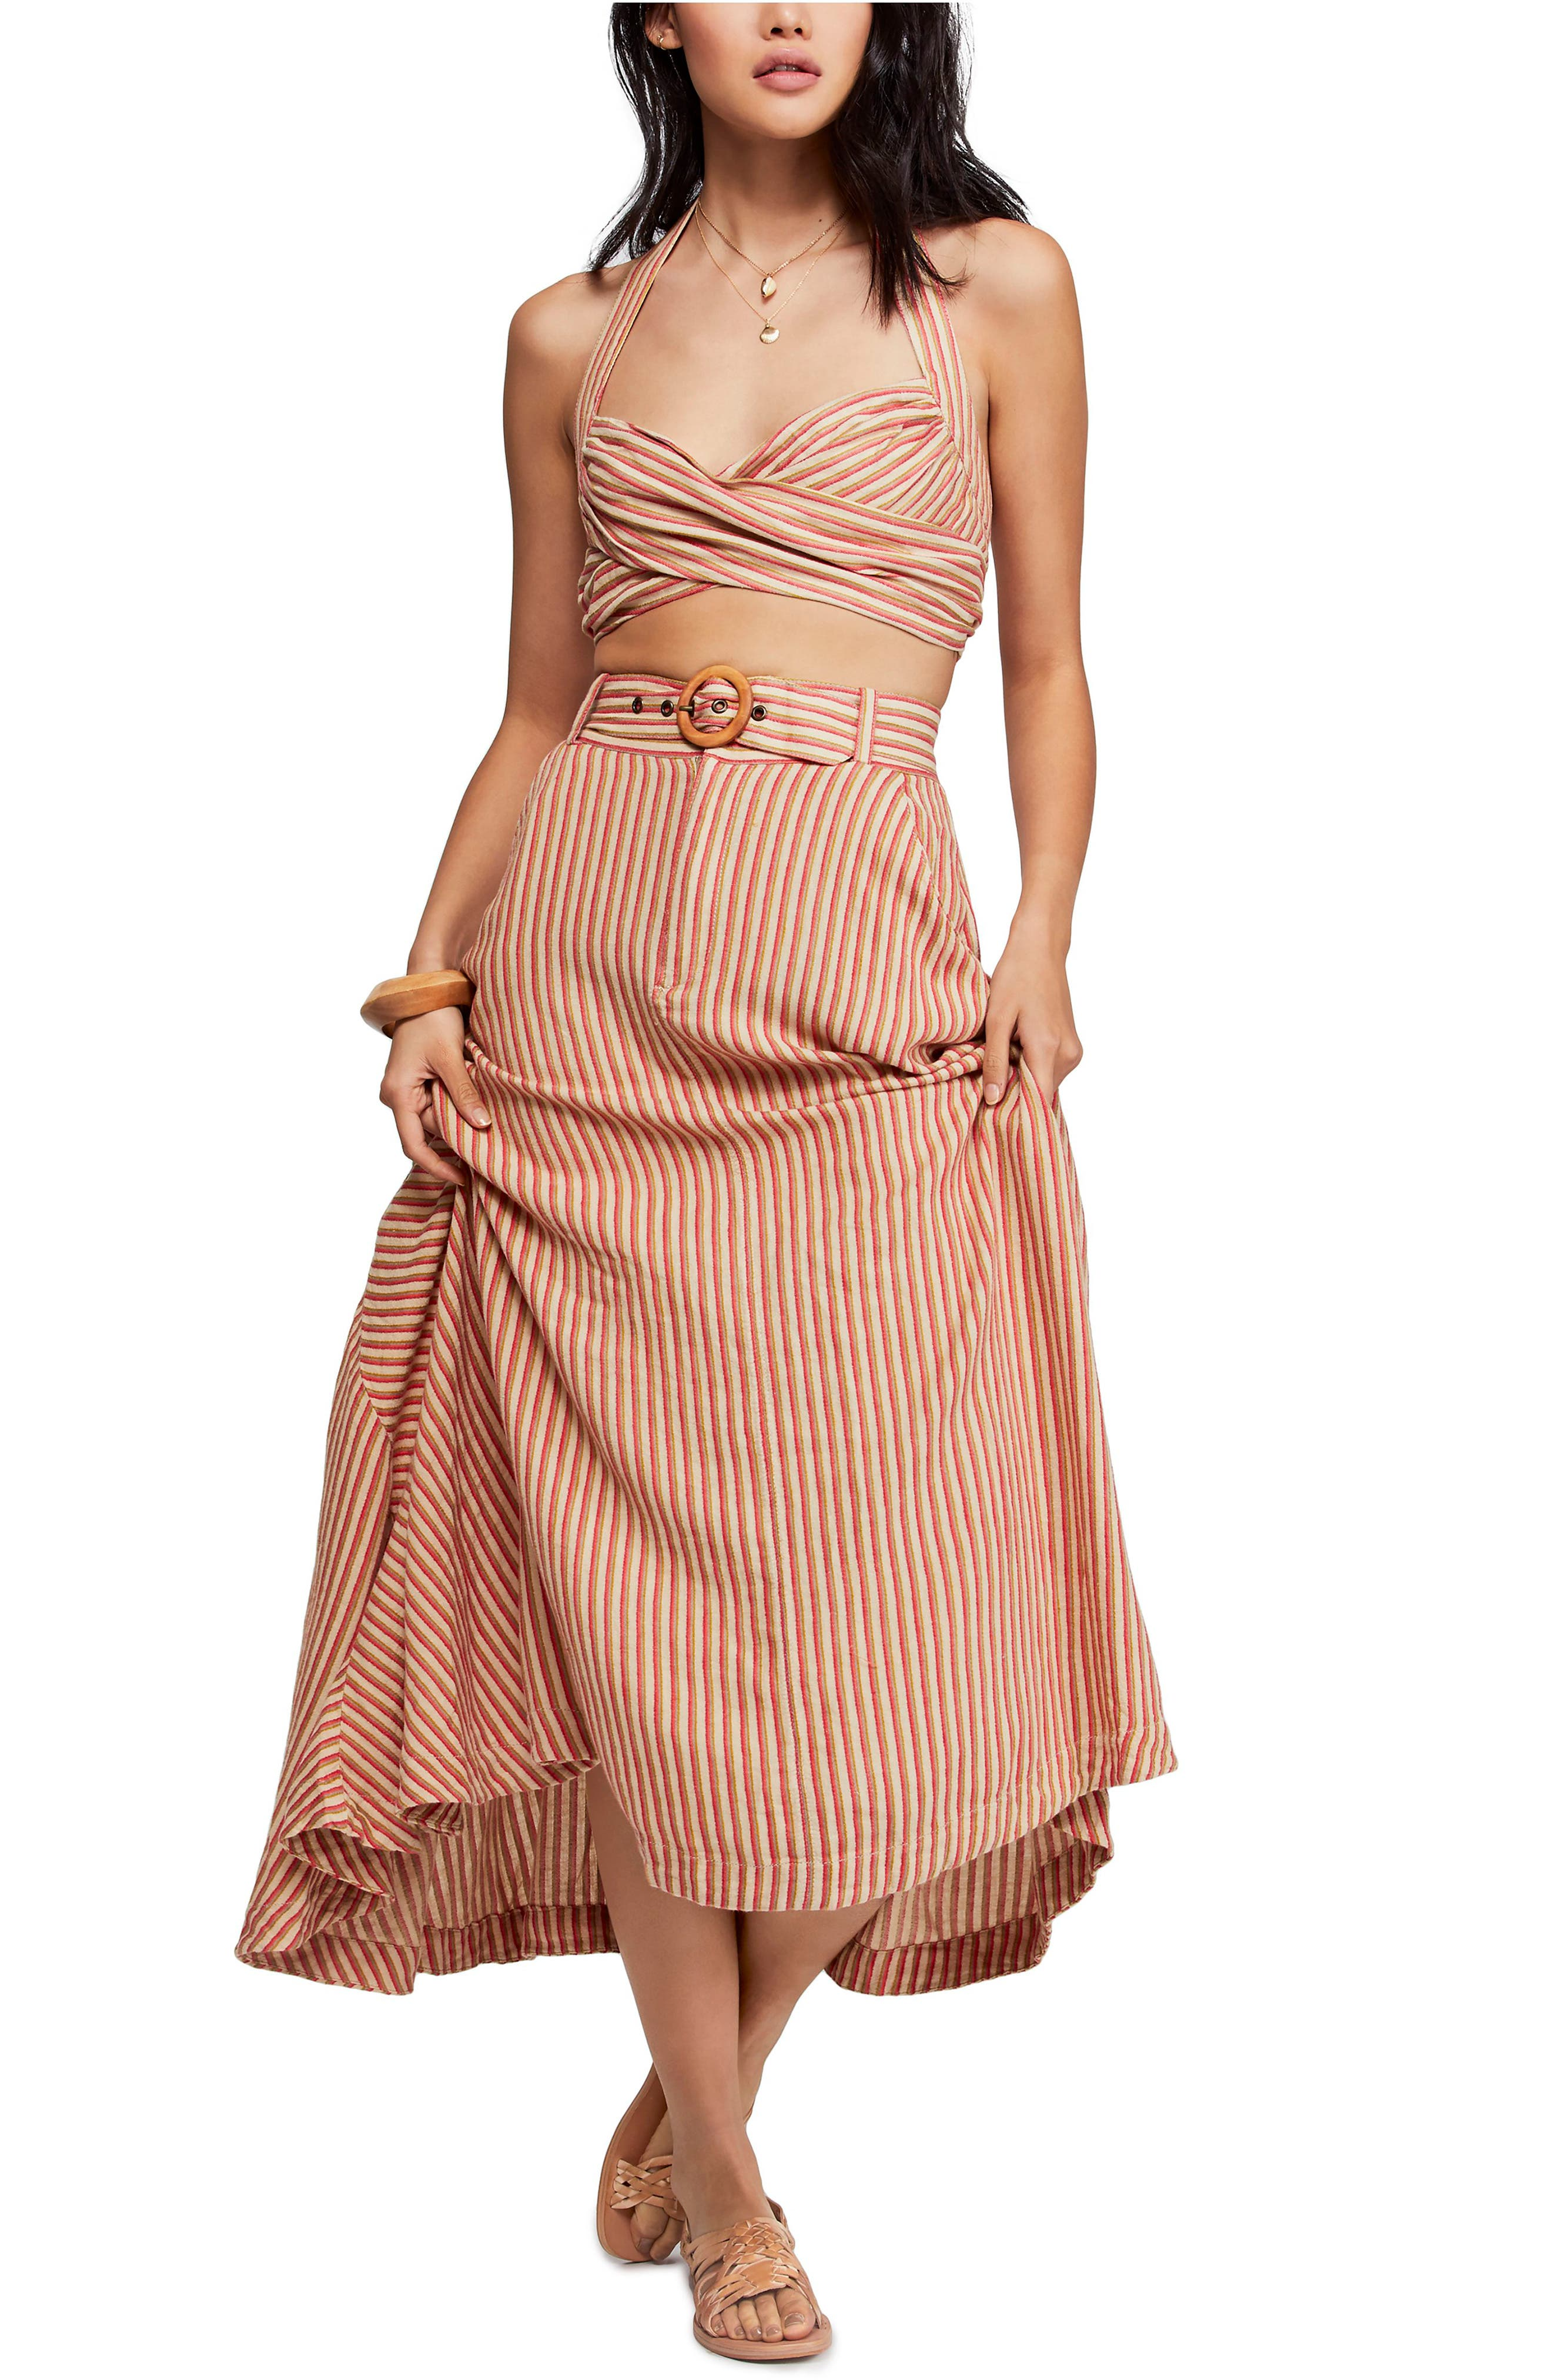 Free People Casablanca Crop Top & Skirt, Orange